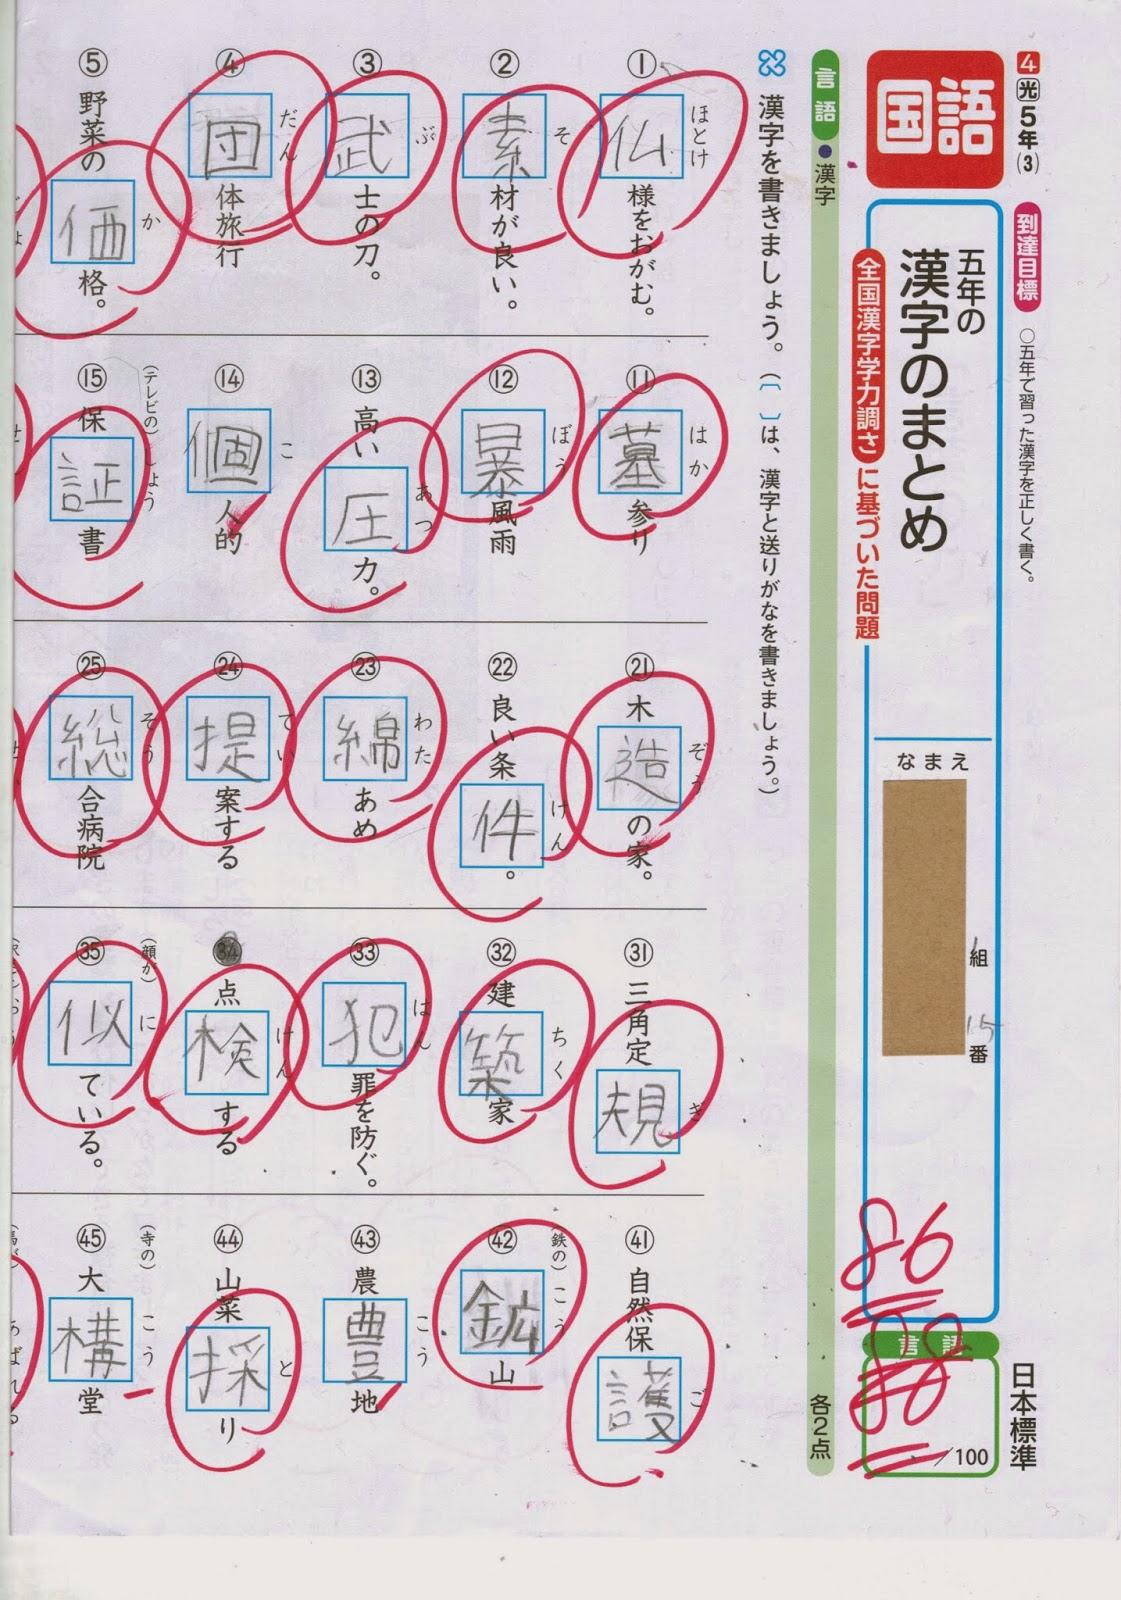 On Dyslexia 5年生のまとめ漢字テスト